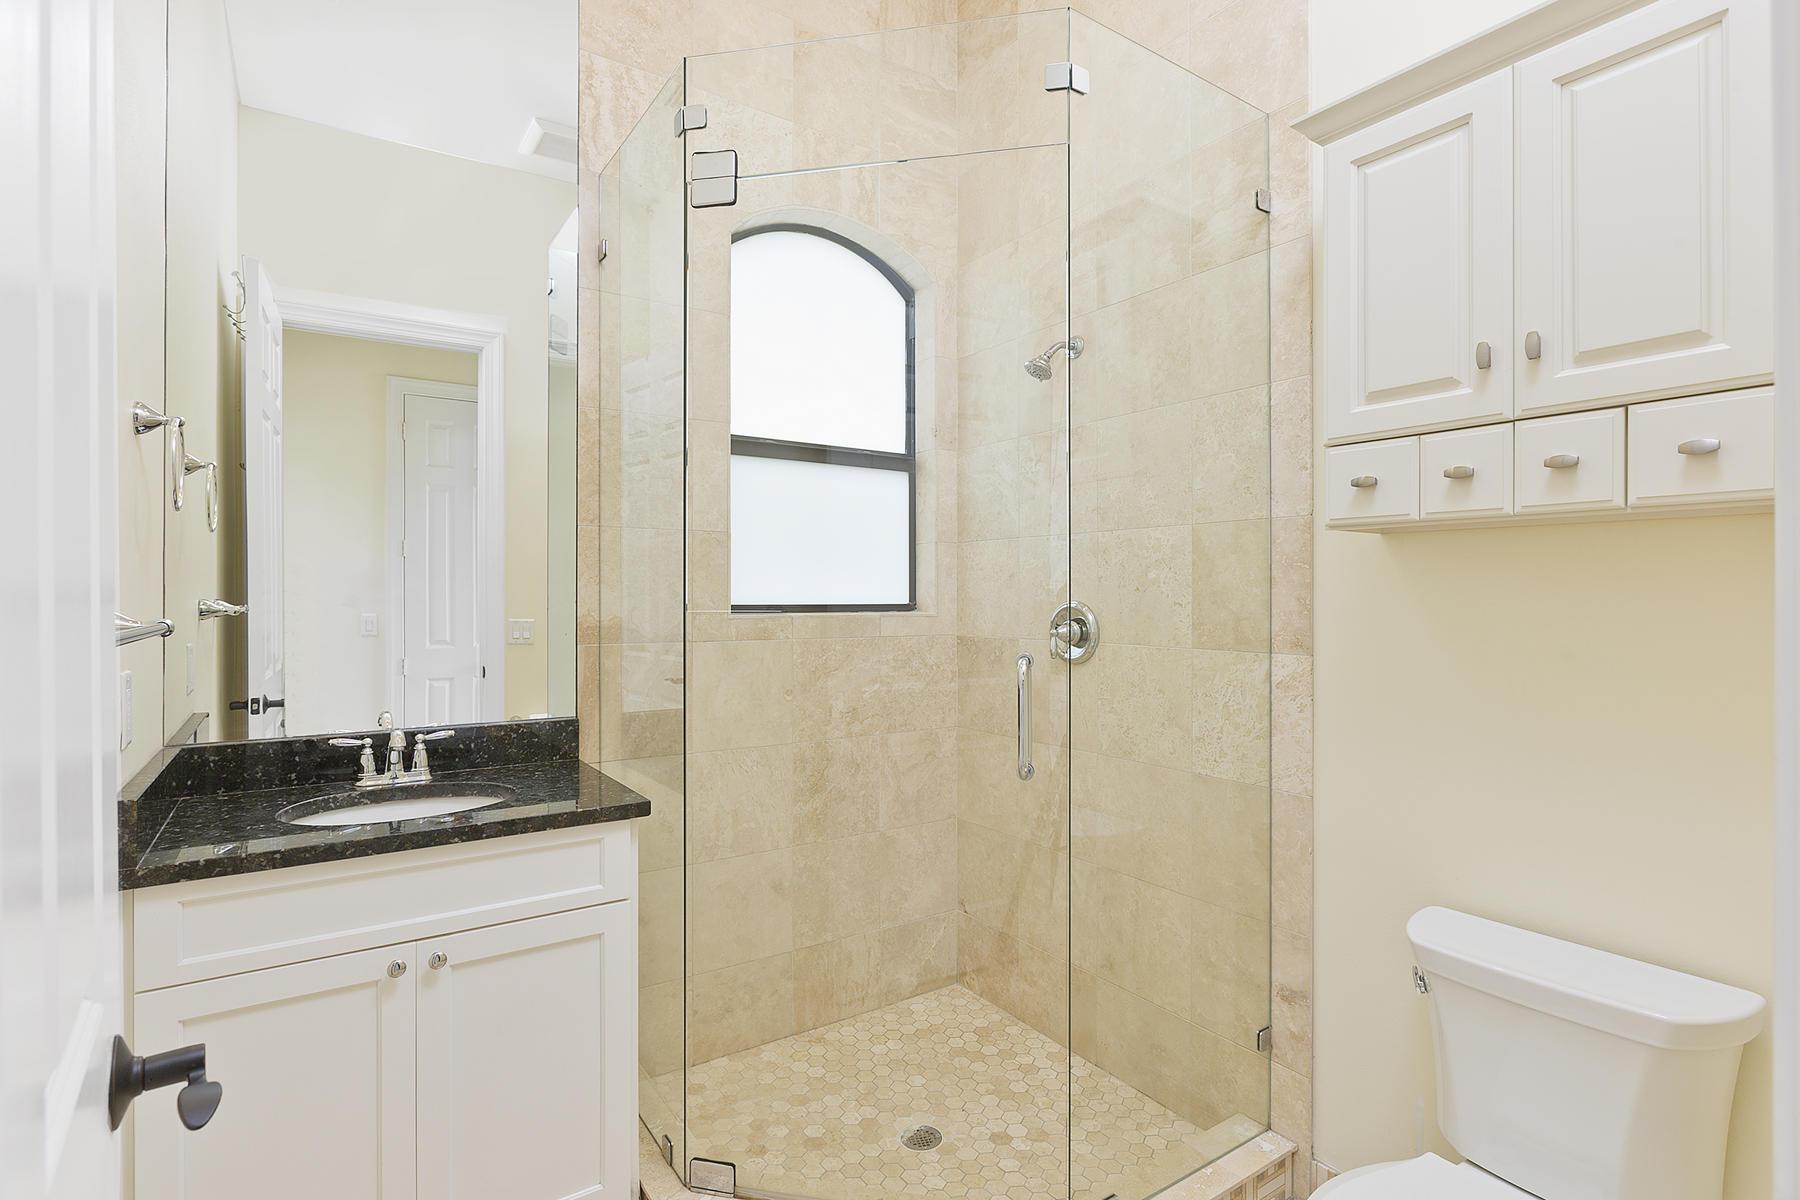 34_BarnCondo_Bathroom